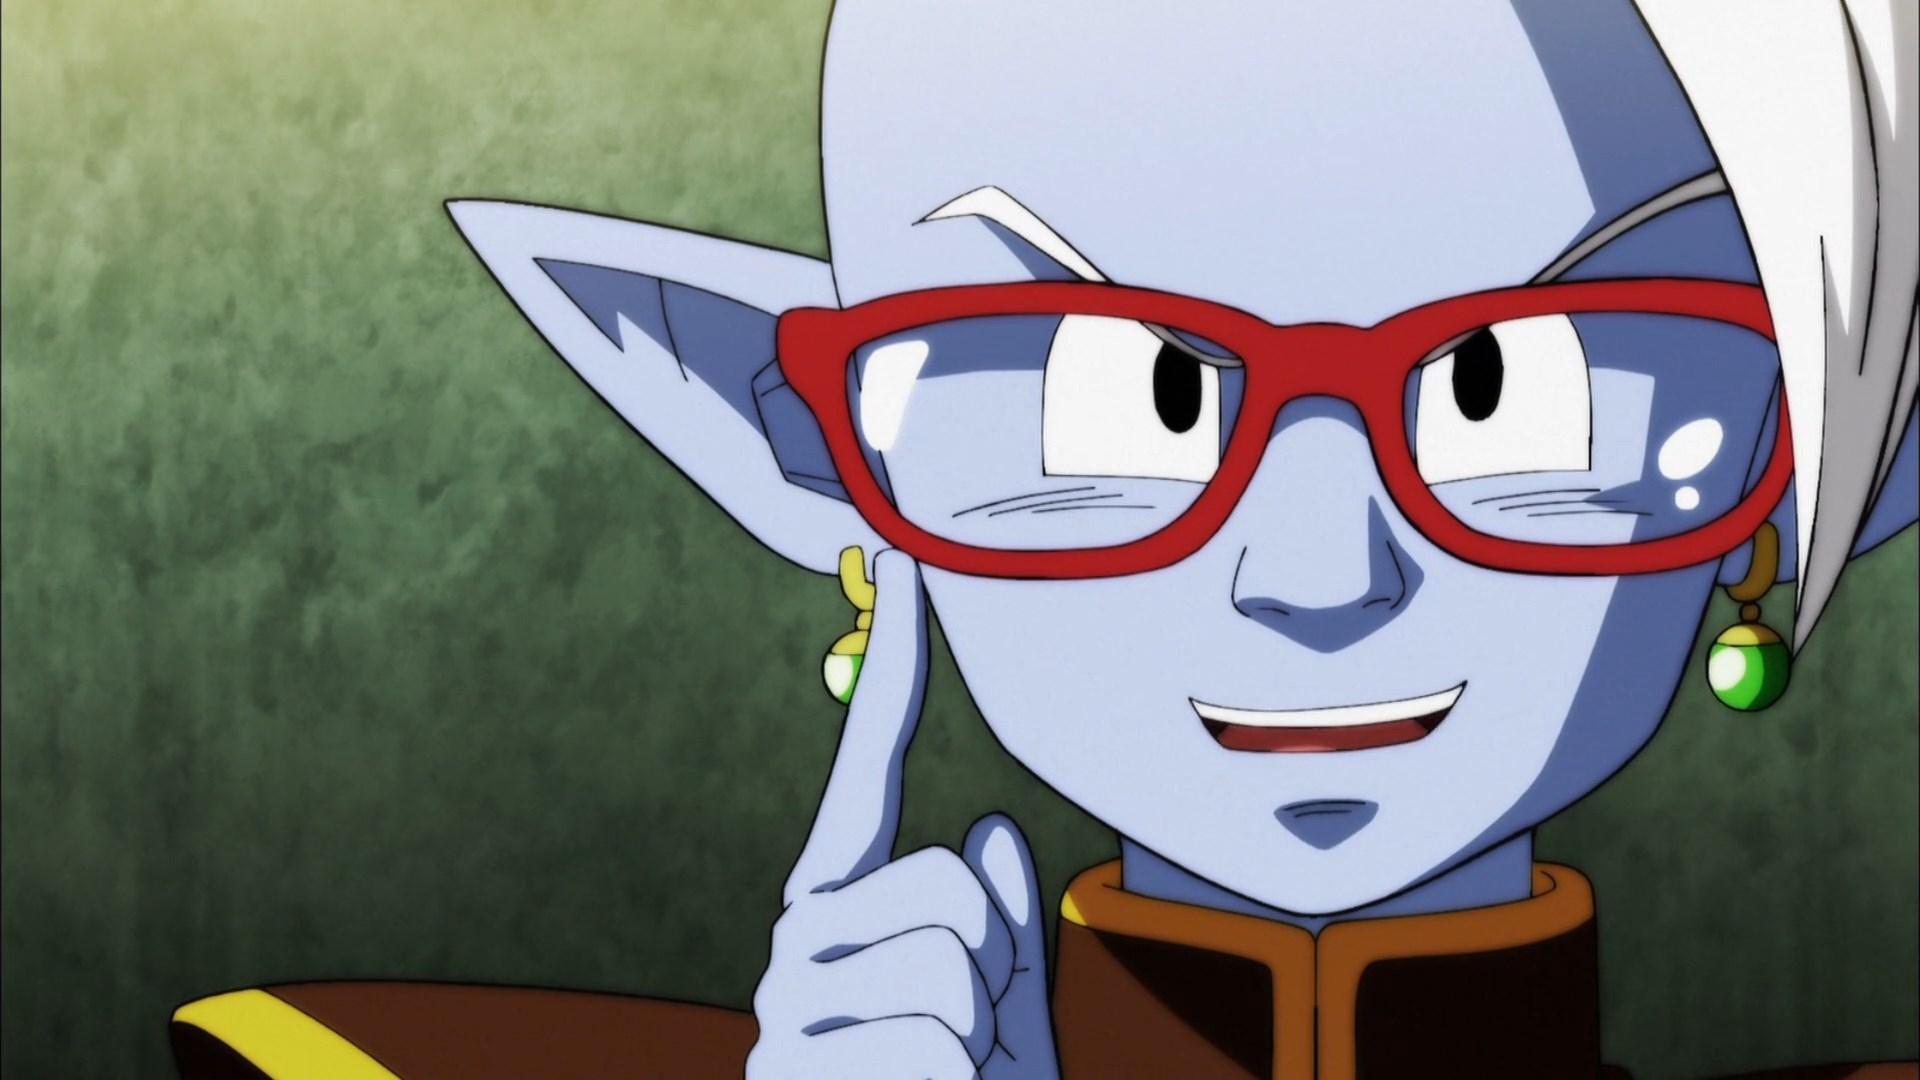 [HorribleSubs] Dragon Ball Super - 121 [1080p].mkv_snapshot_06.10